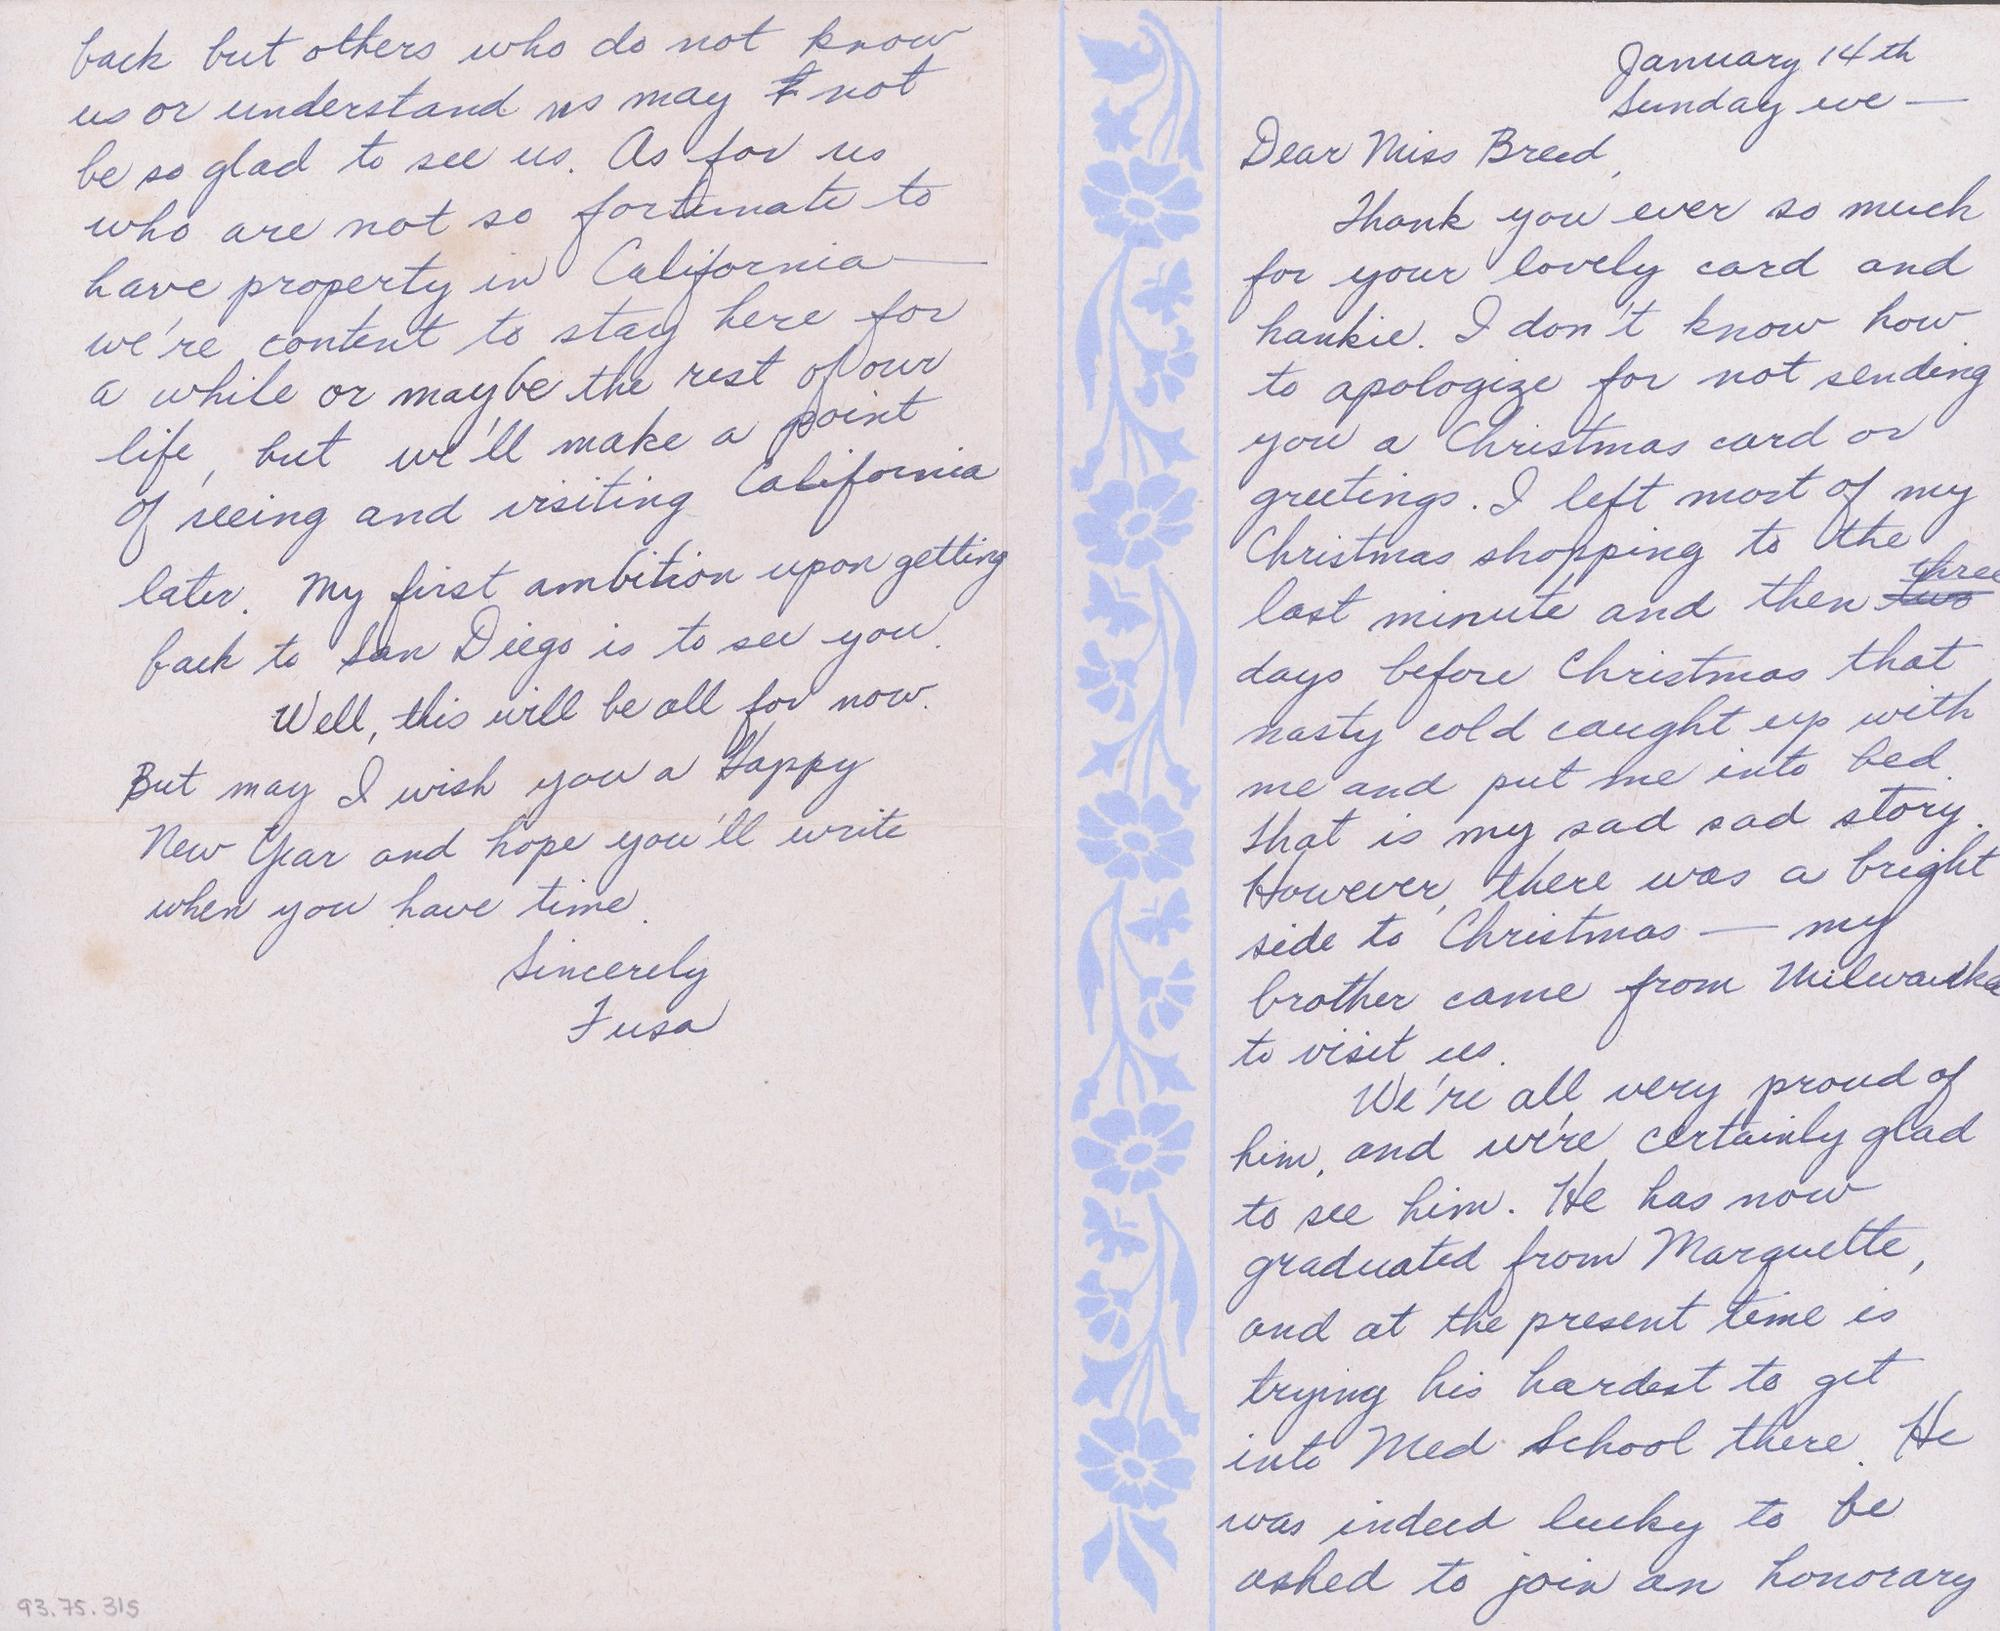 A 1945 letter from Fusa Tsumagari.